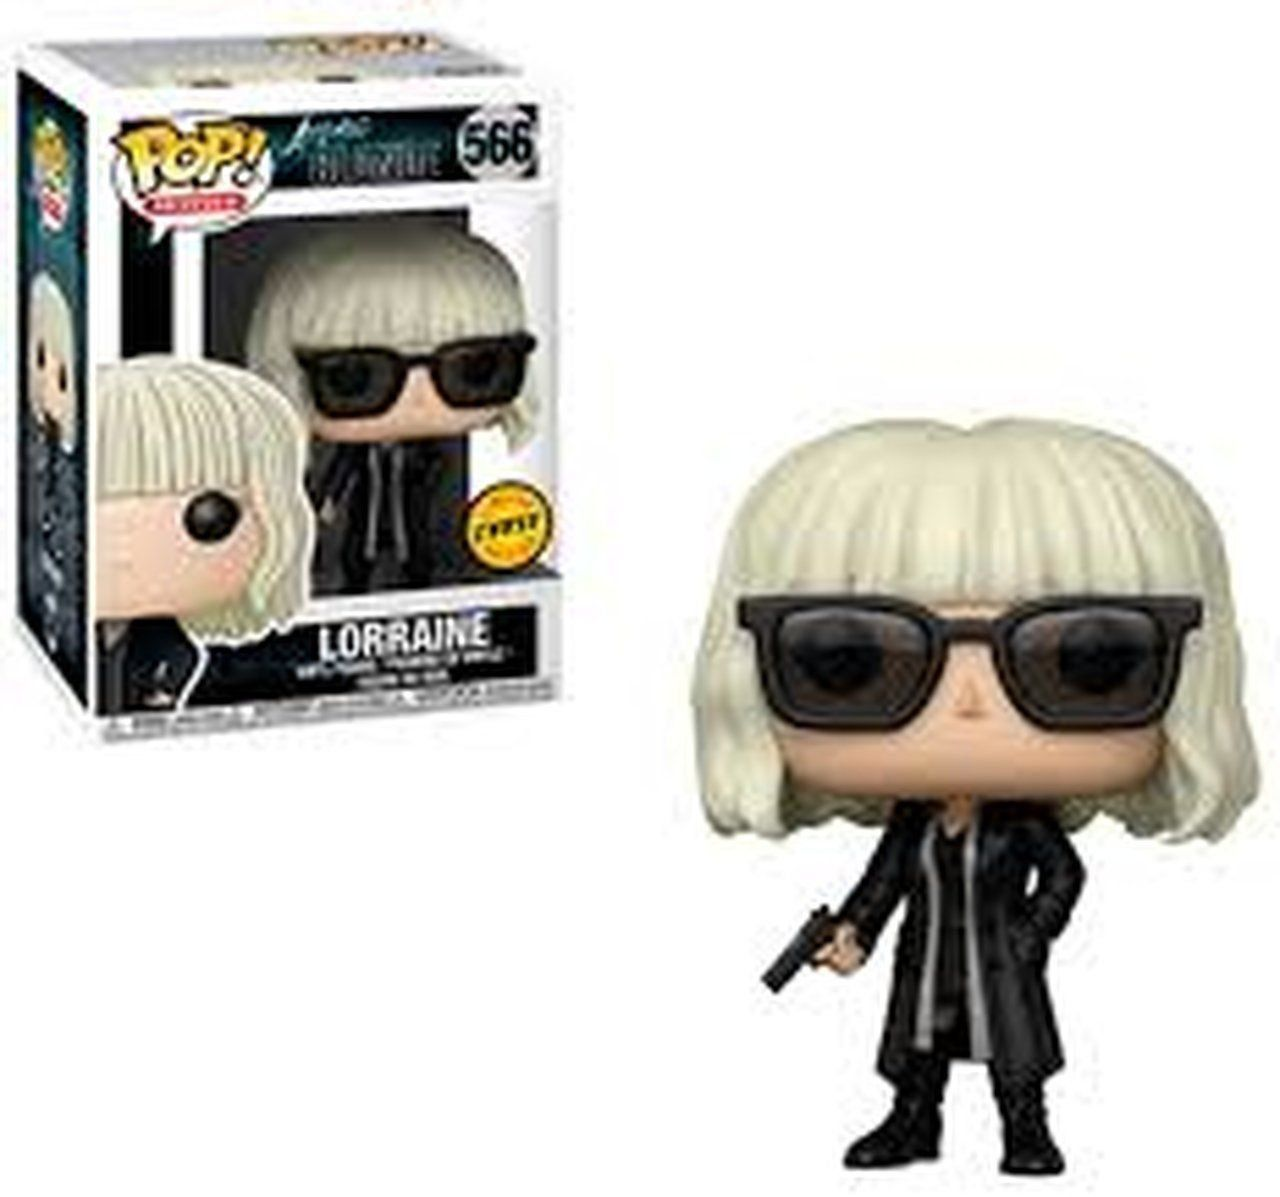 PRÉ VENDA: Funko Pop! Blonde Lorraine with Gun (Chase): Atomica (Atomic) #566 - Funko